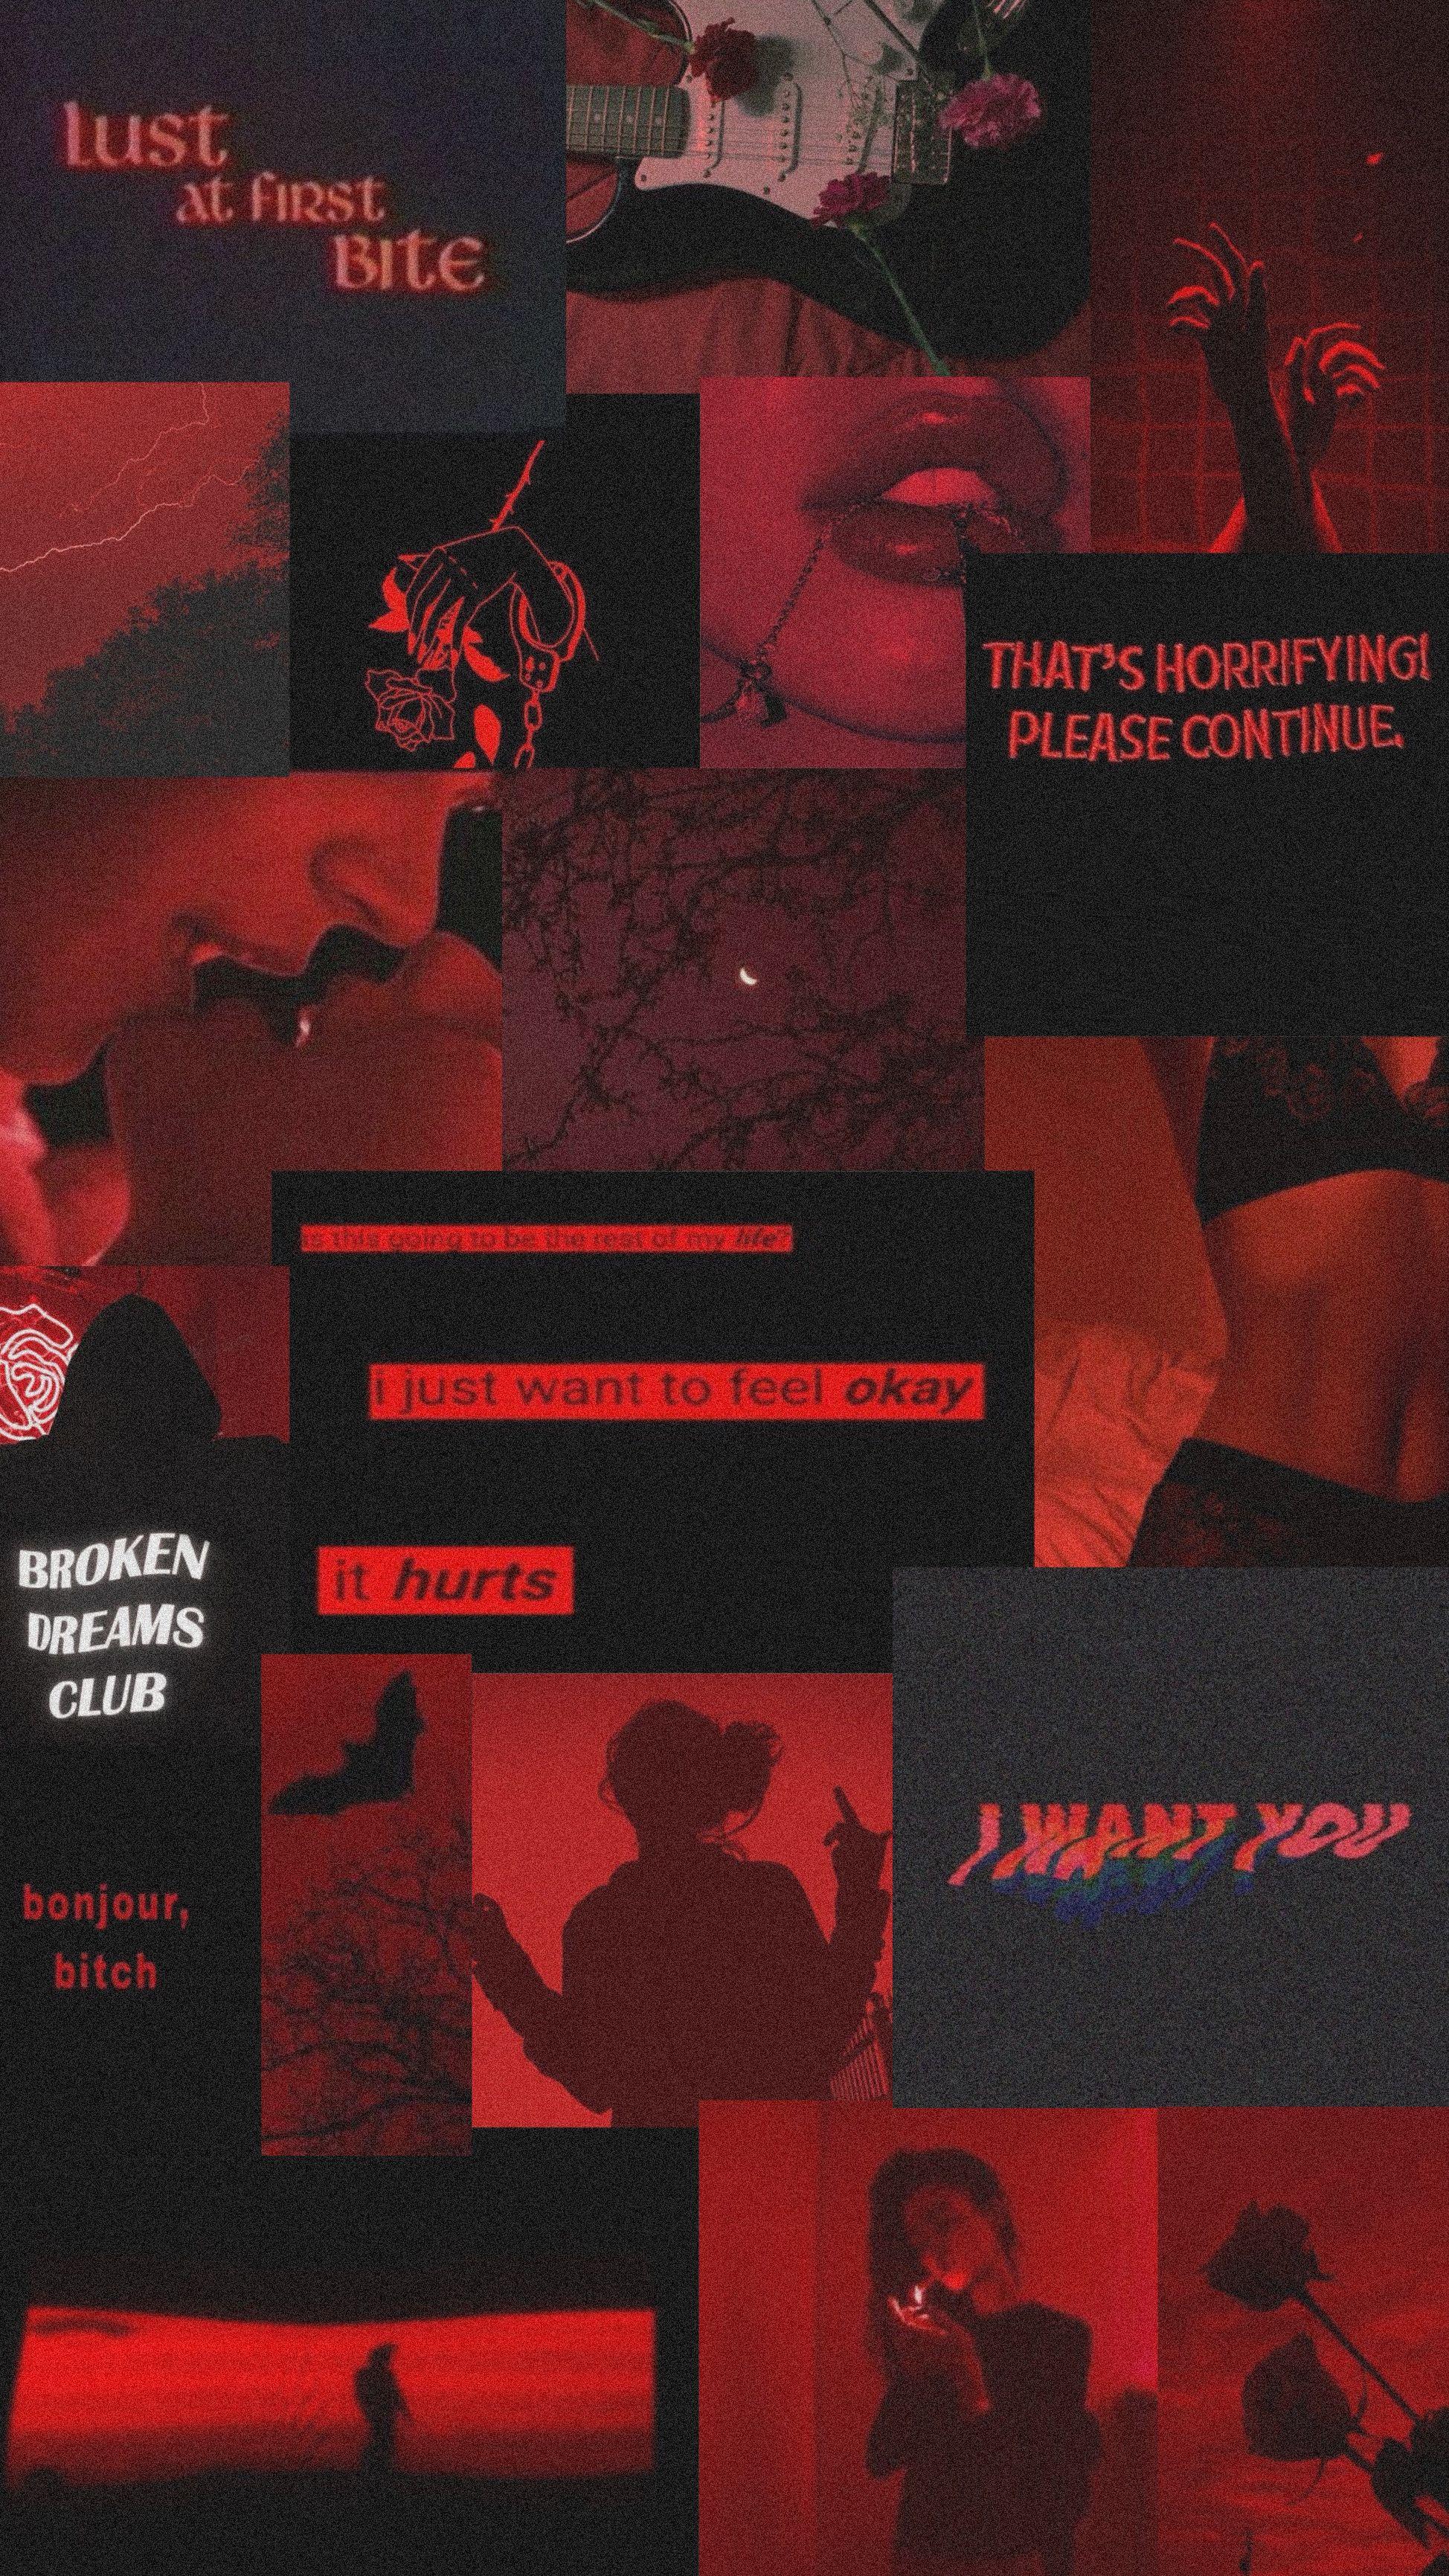 Grunge Edgy Wallpaper : grunge, wallpaper, Grunge, Wallpaper, Aesthetic, Collage, Background, Trendy, Black, Wallpaper,, Aesthetic,